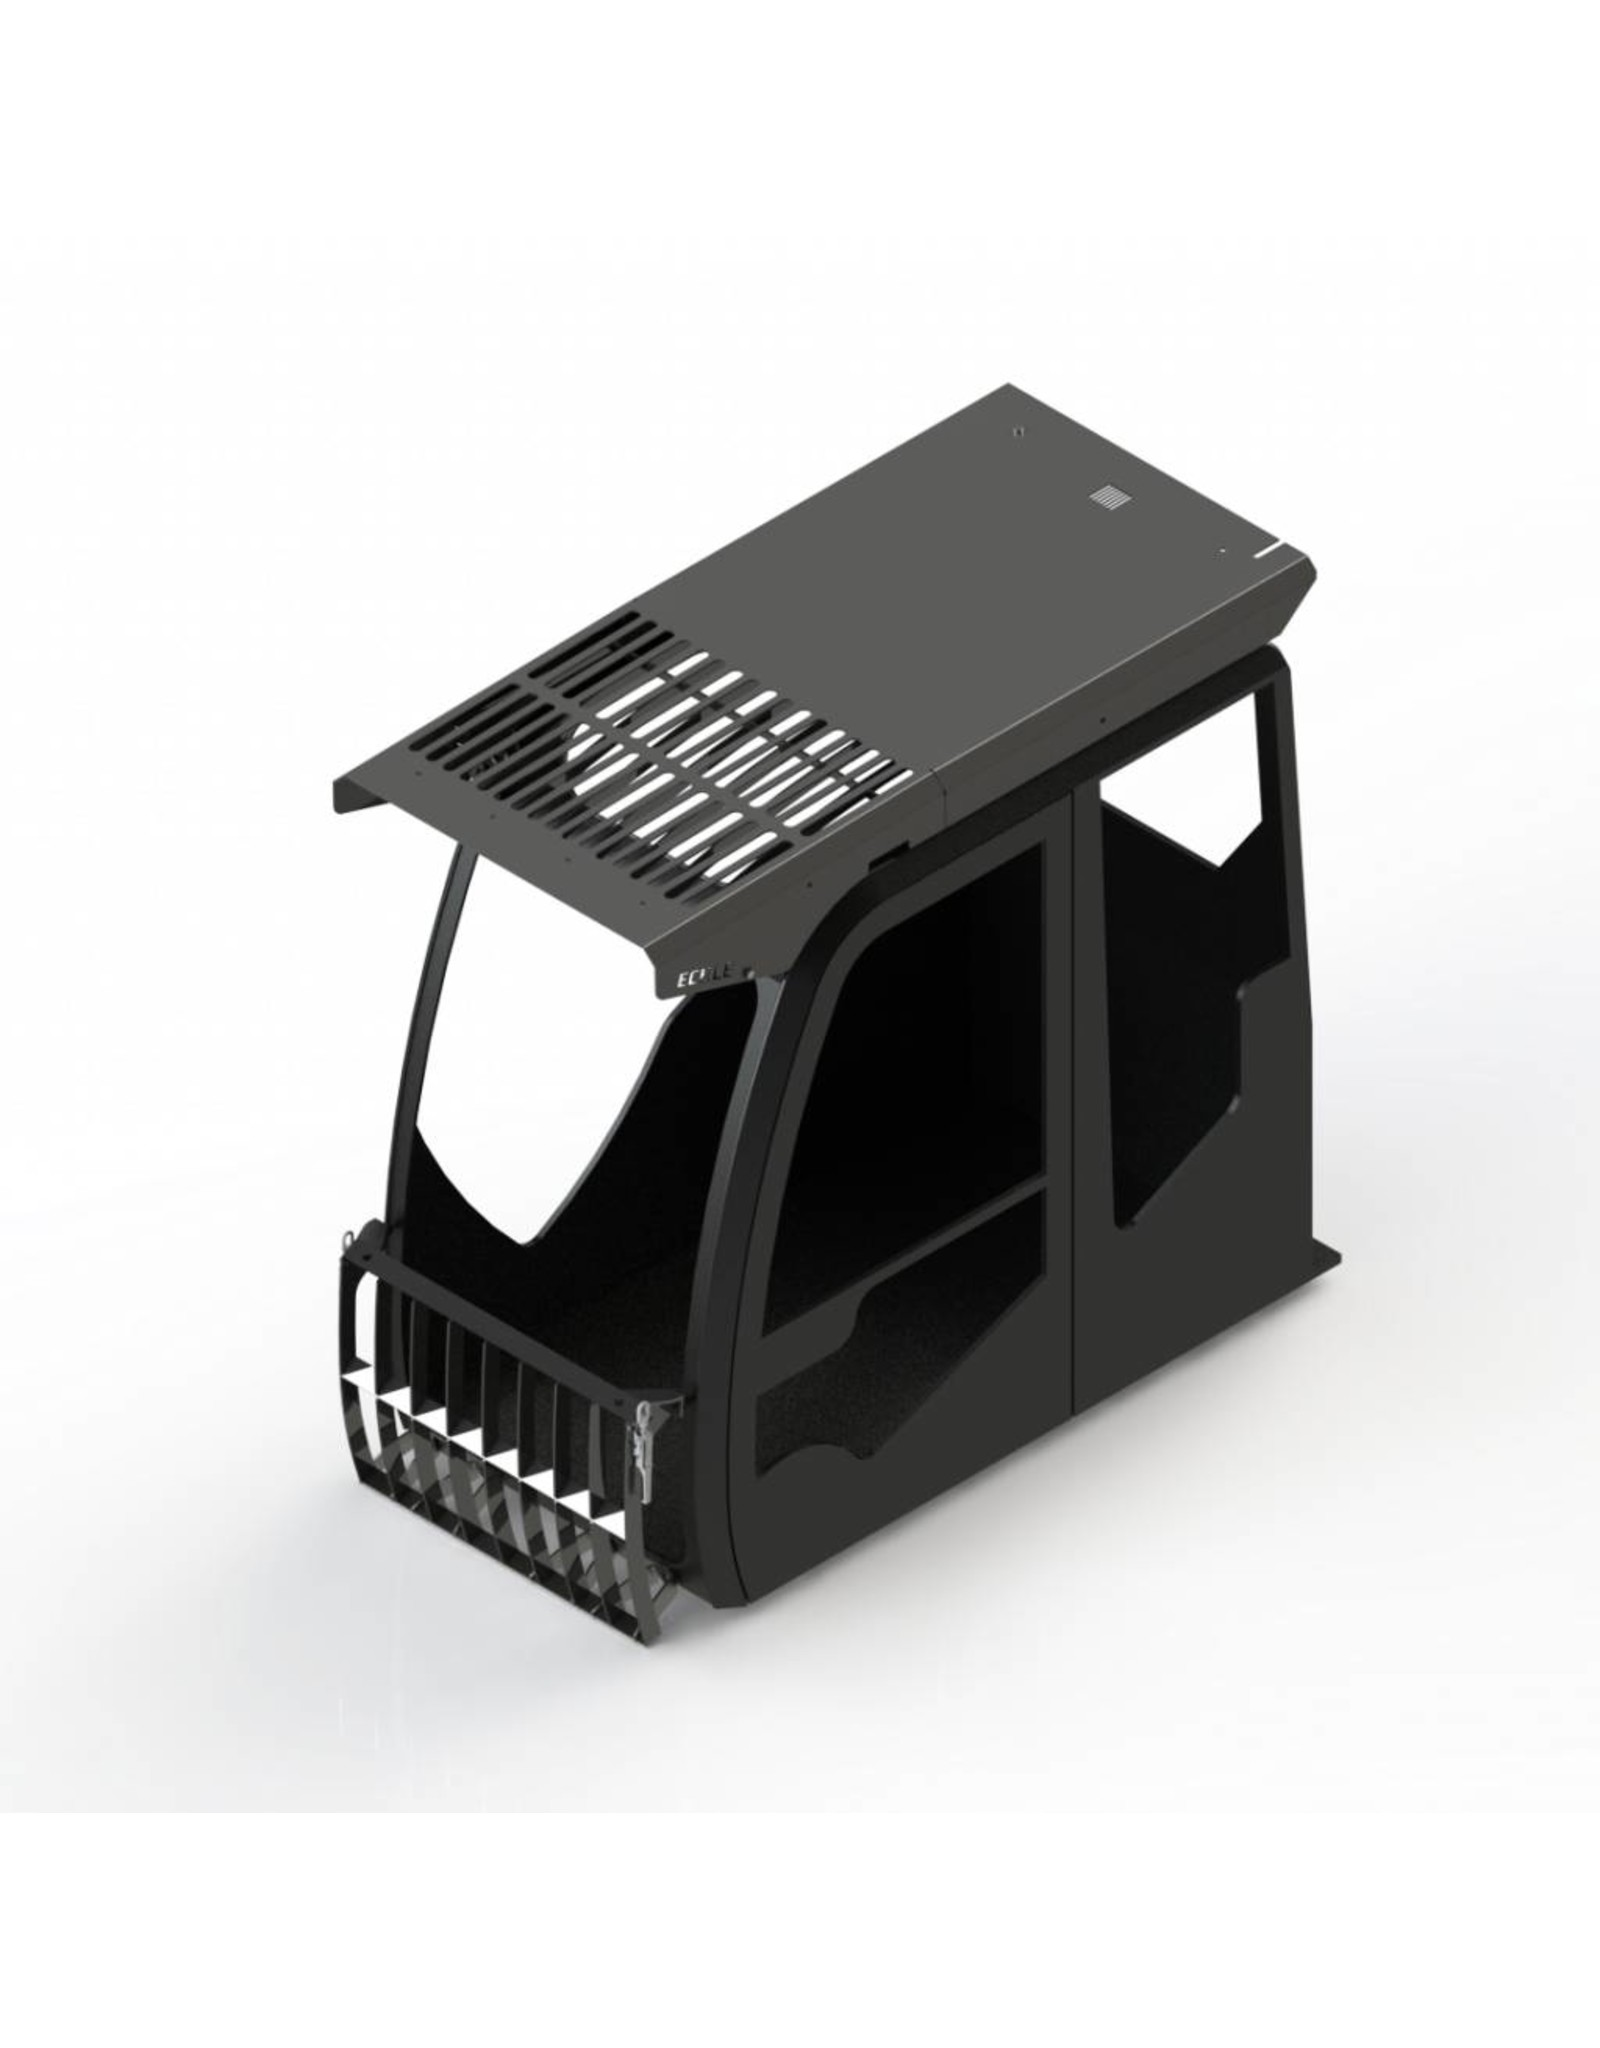 Echle Hartstahl GmbH FOPS für Doosan DX530LC-5